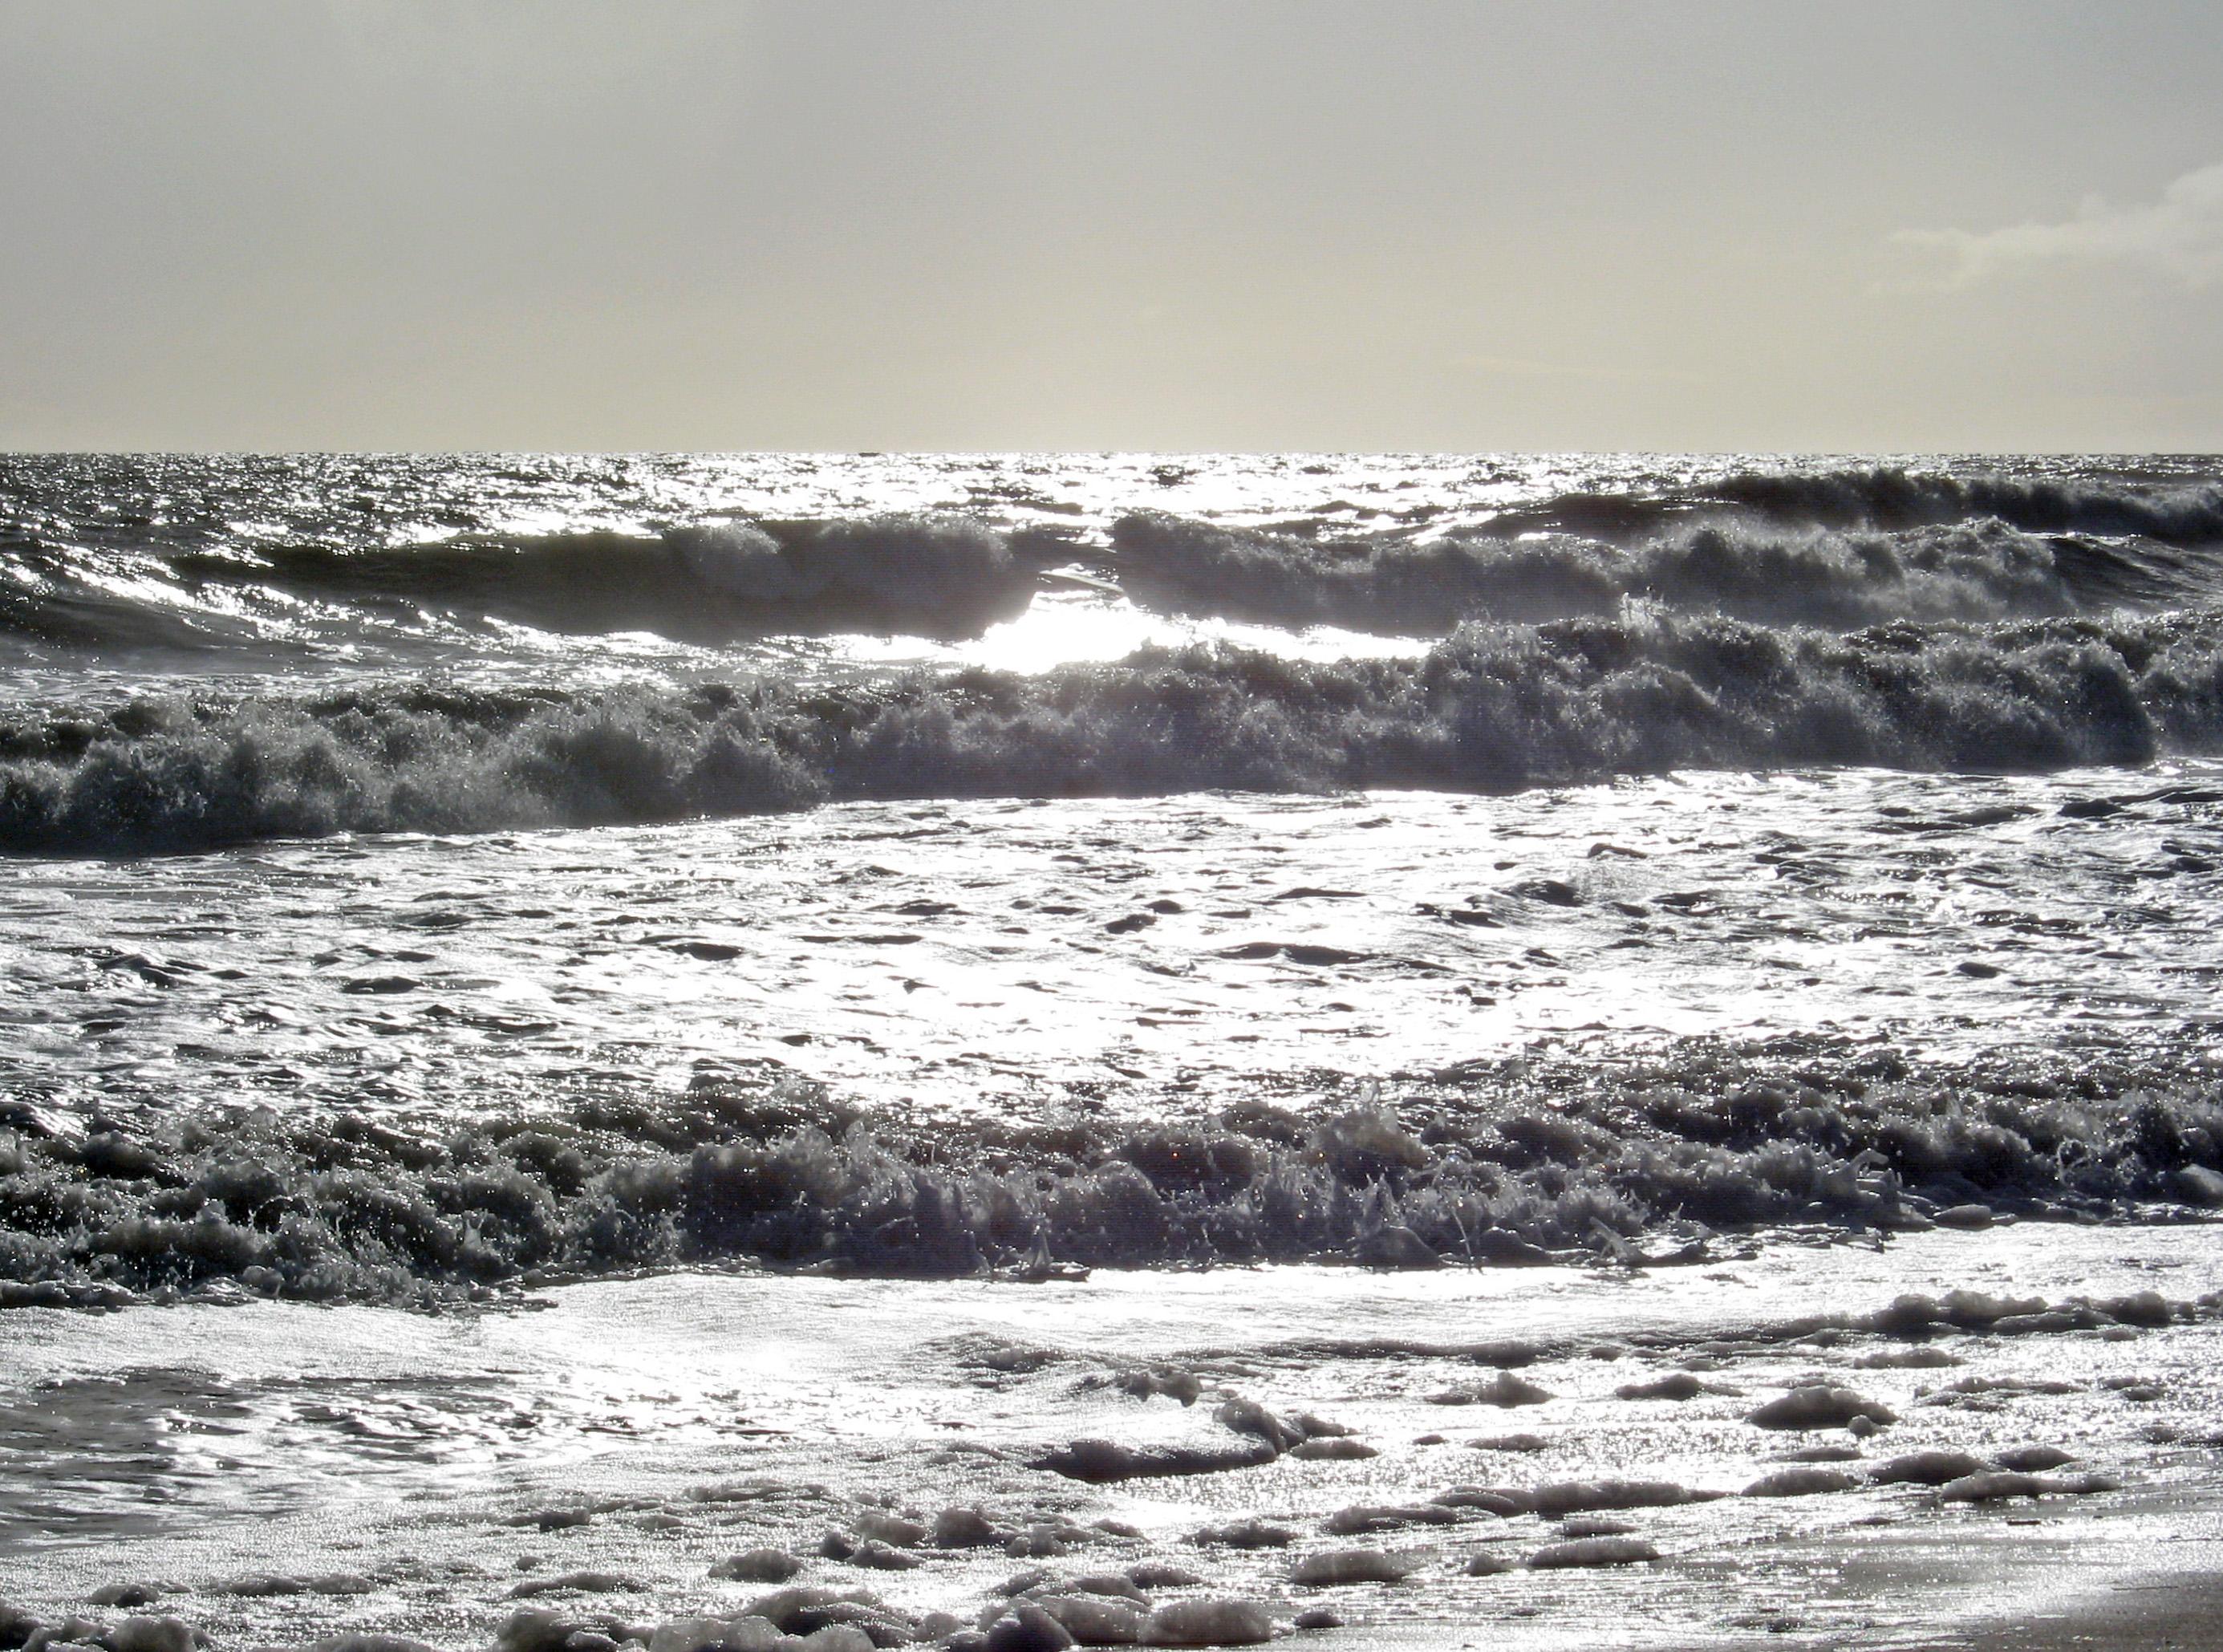 FileGray Ocean SurfJPG Wikimedia Commons